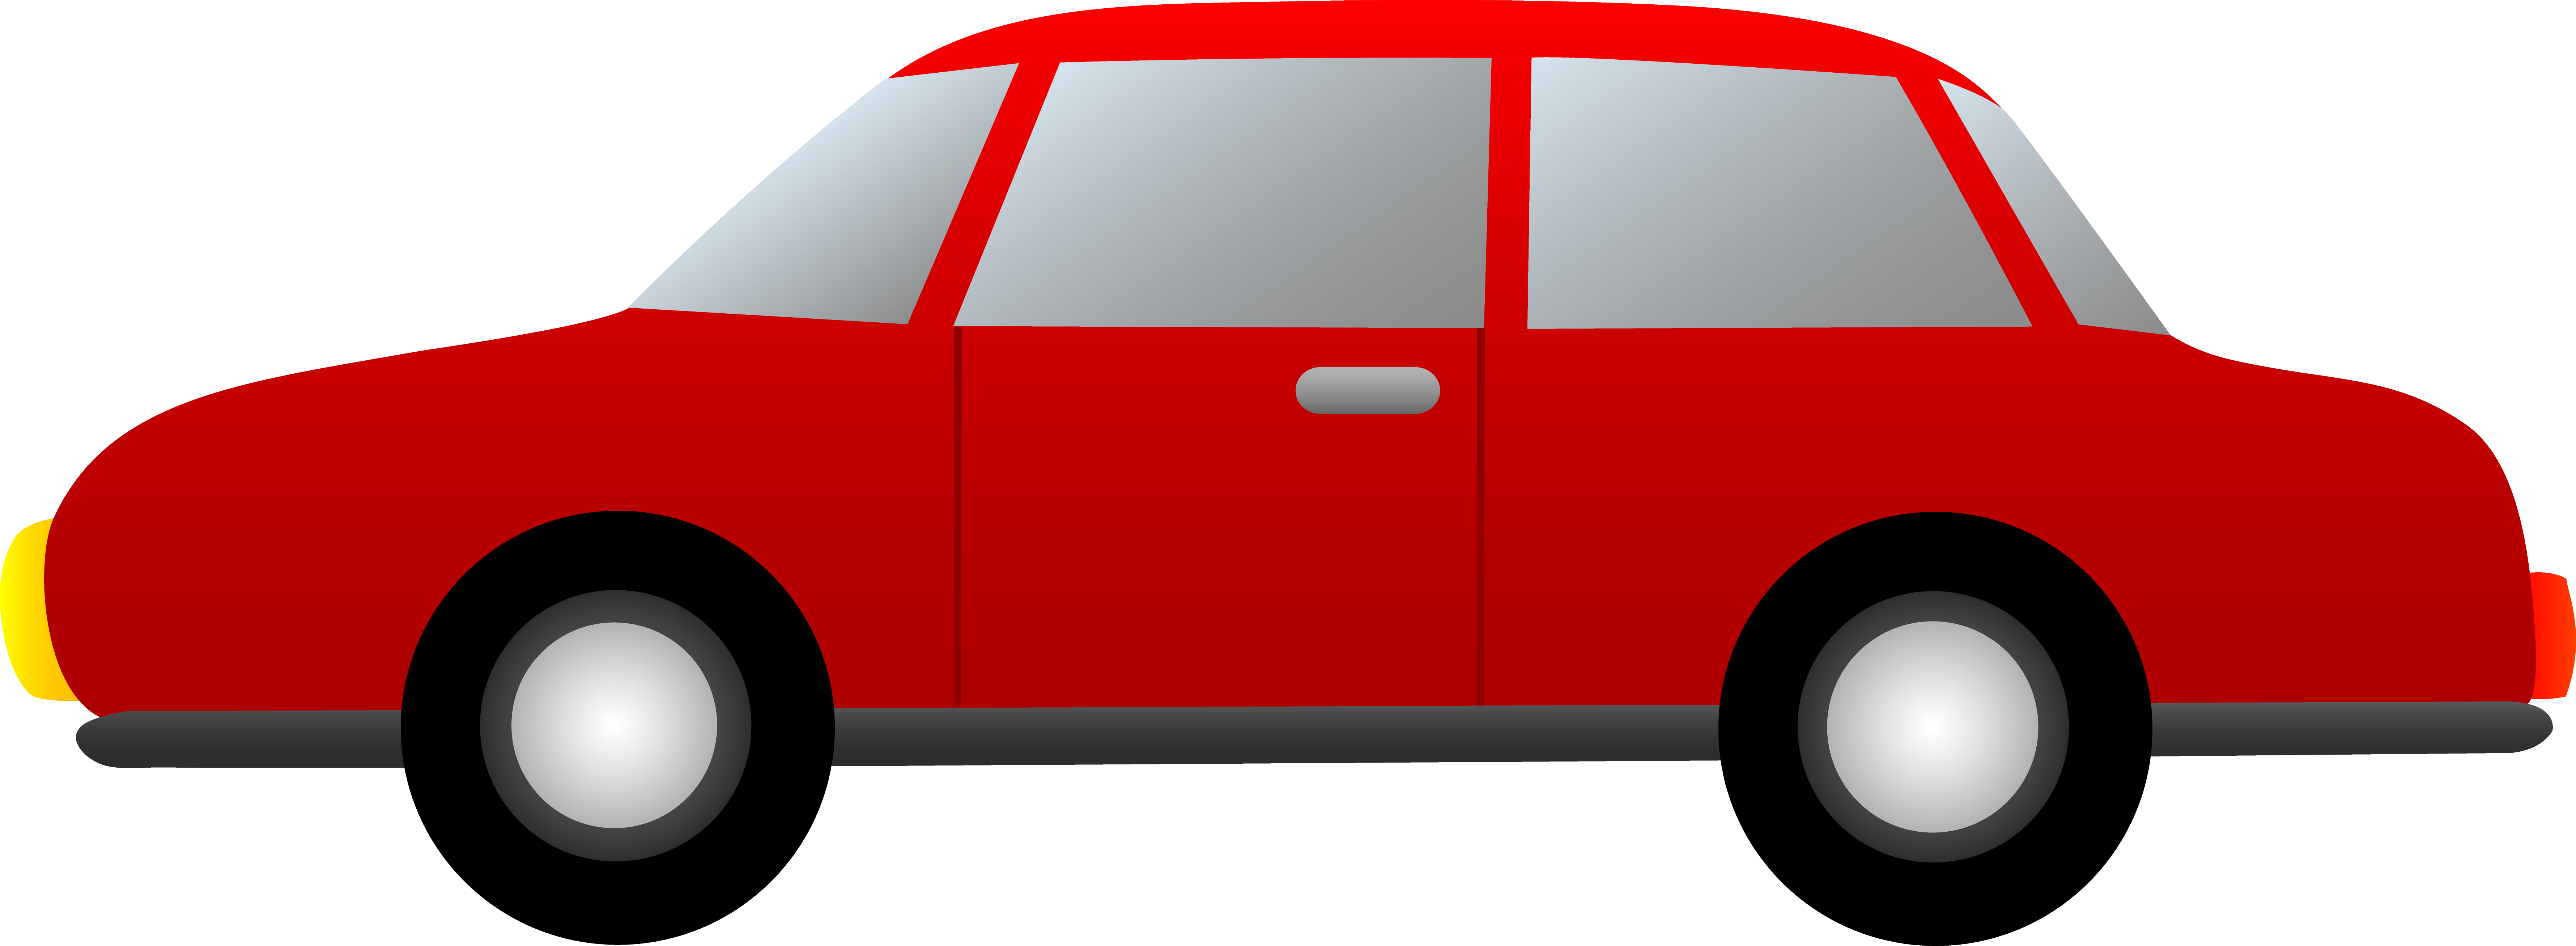 7122x2615 Pick Up Truck Cliprt. Preview Clipart Caucasian Man Driving